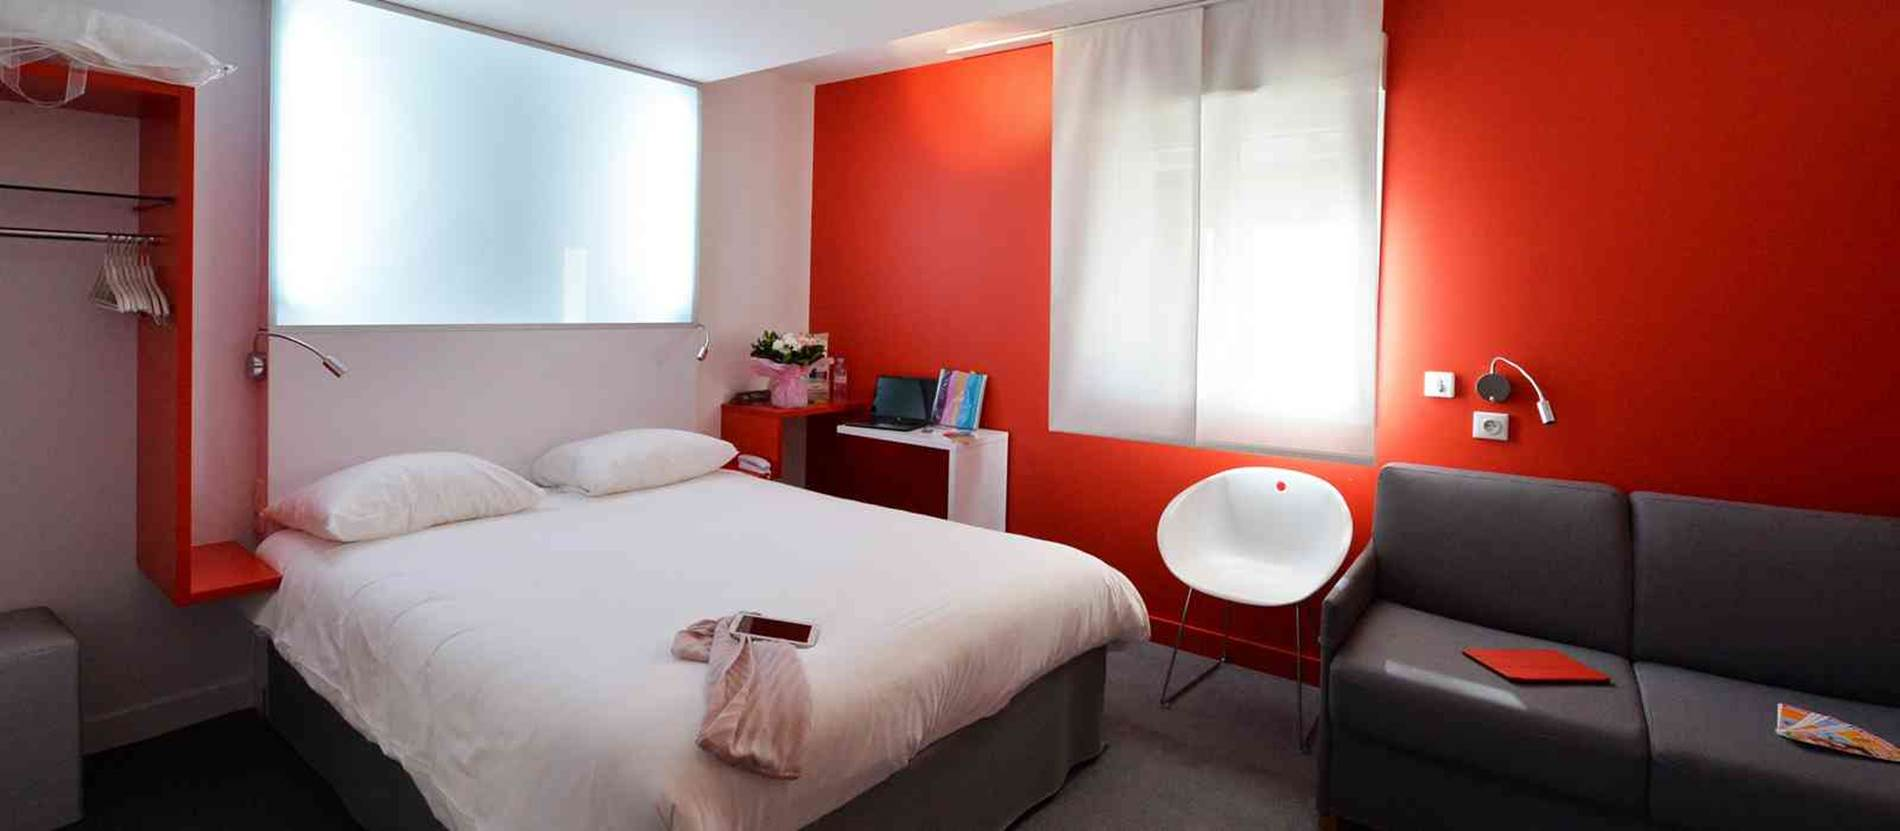 hotel-ibis-styles-vannes-chambre © hotel-ibis-styles